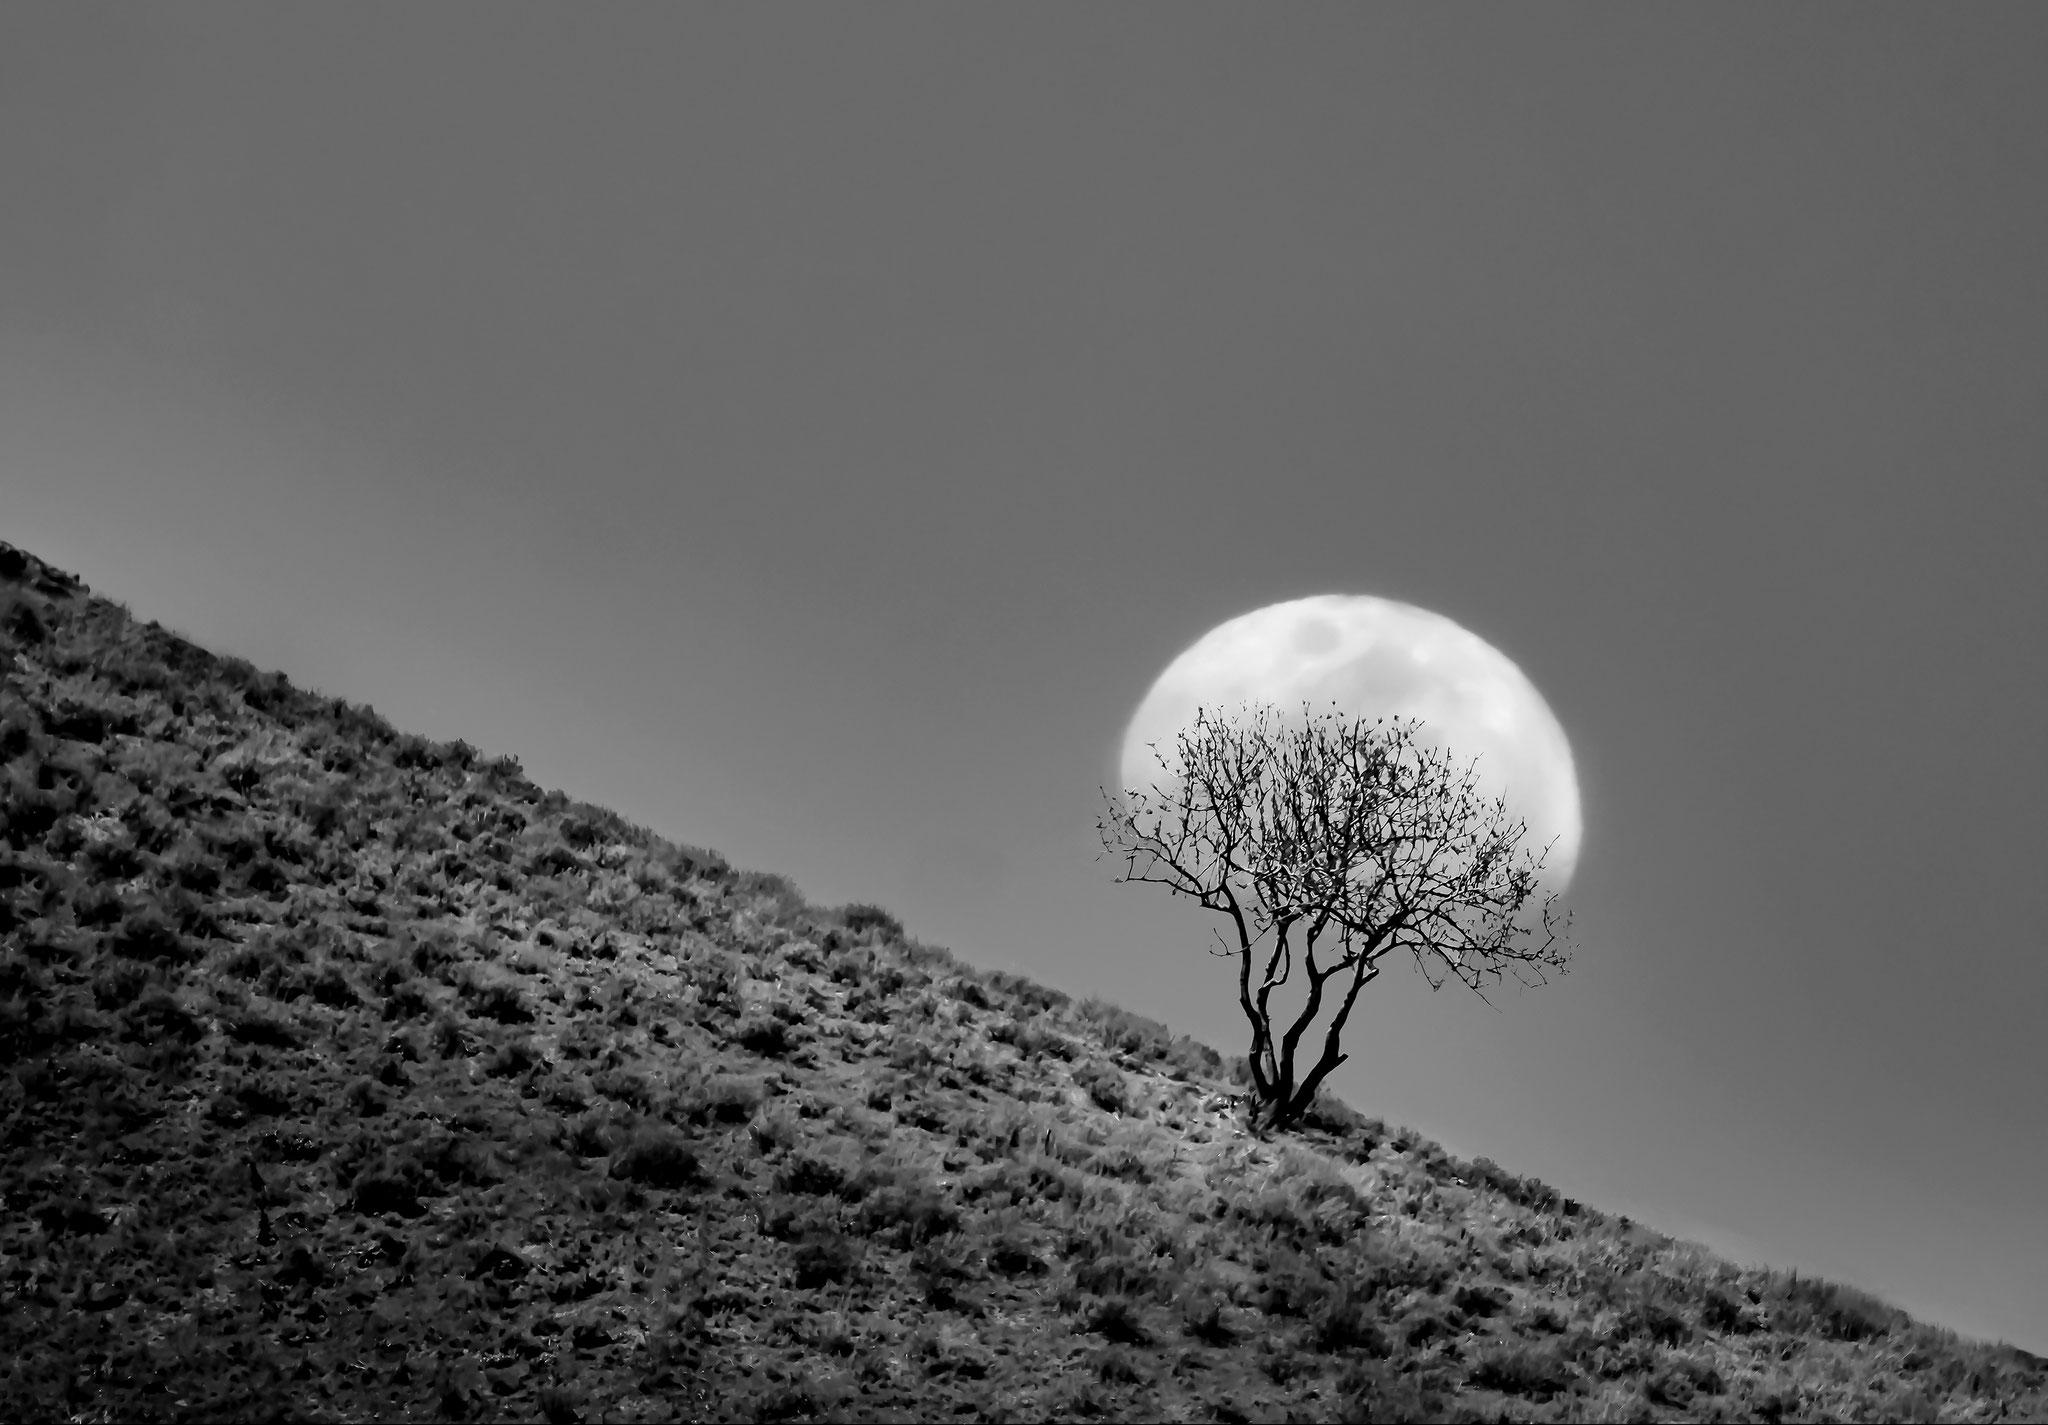 Yarta Younesi (Iran) - The root of the moon